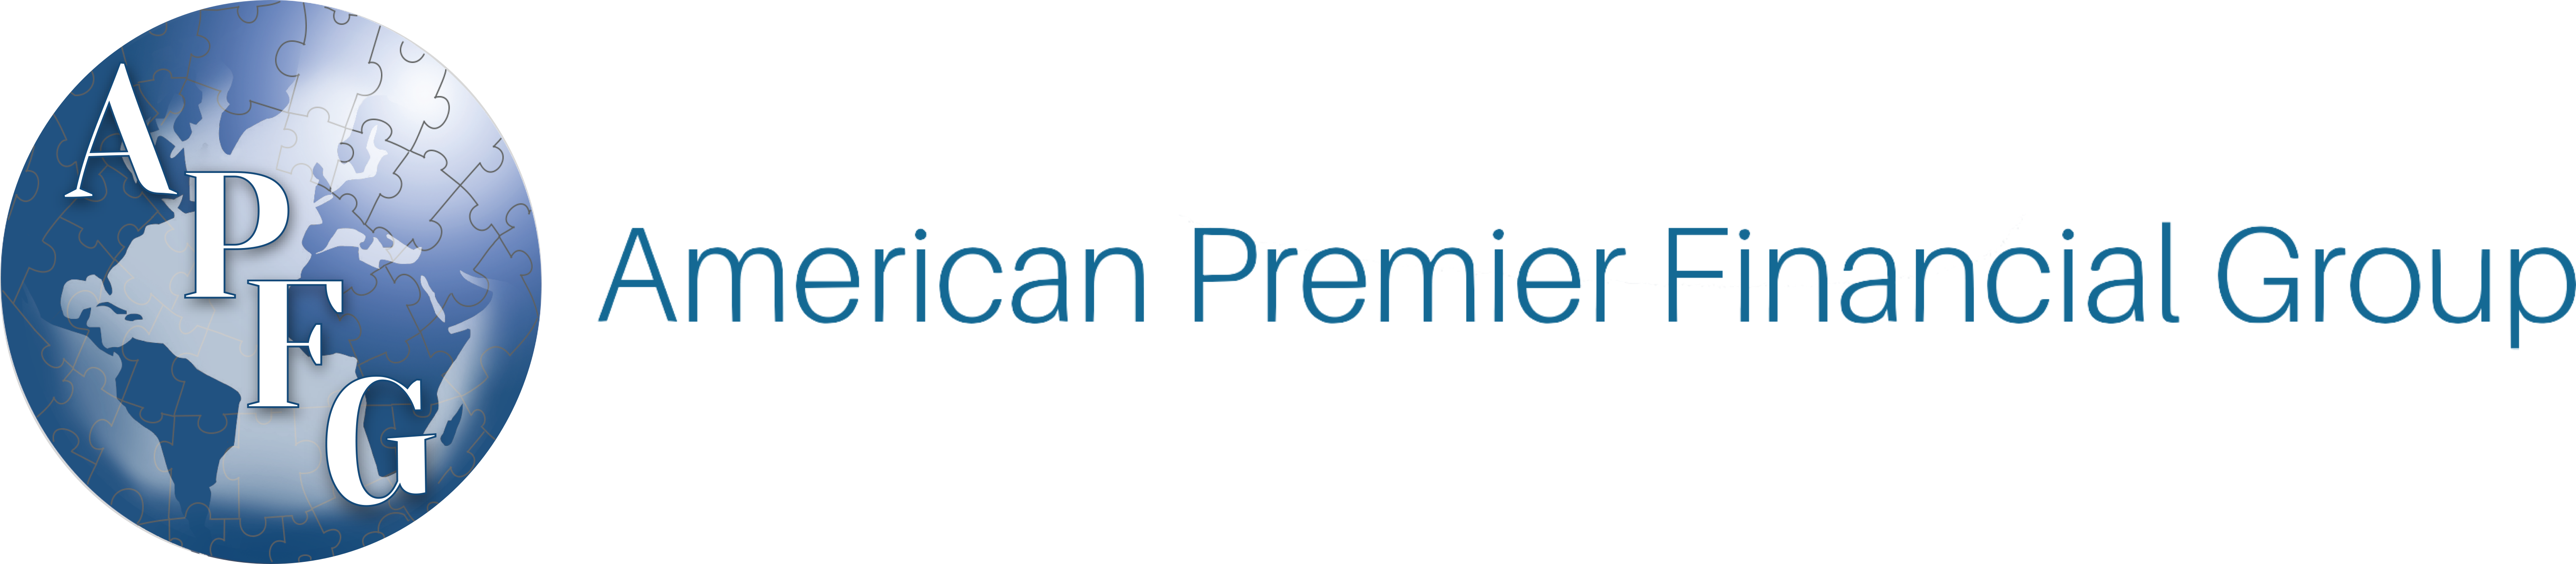 American Premier Financial Group